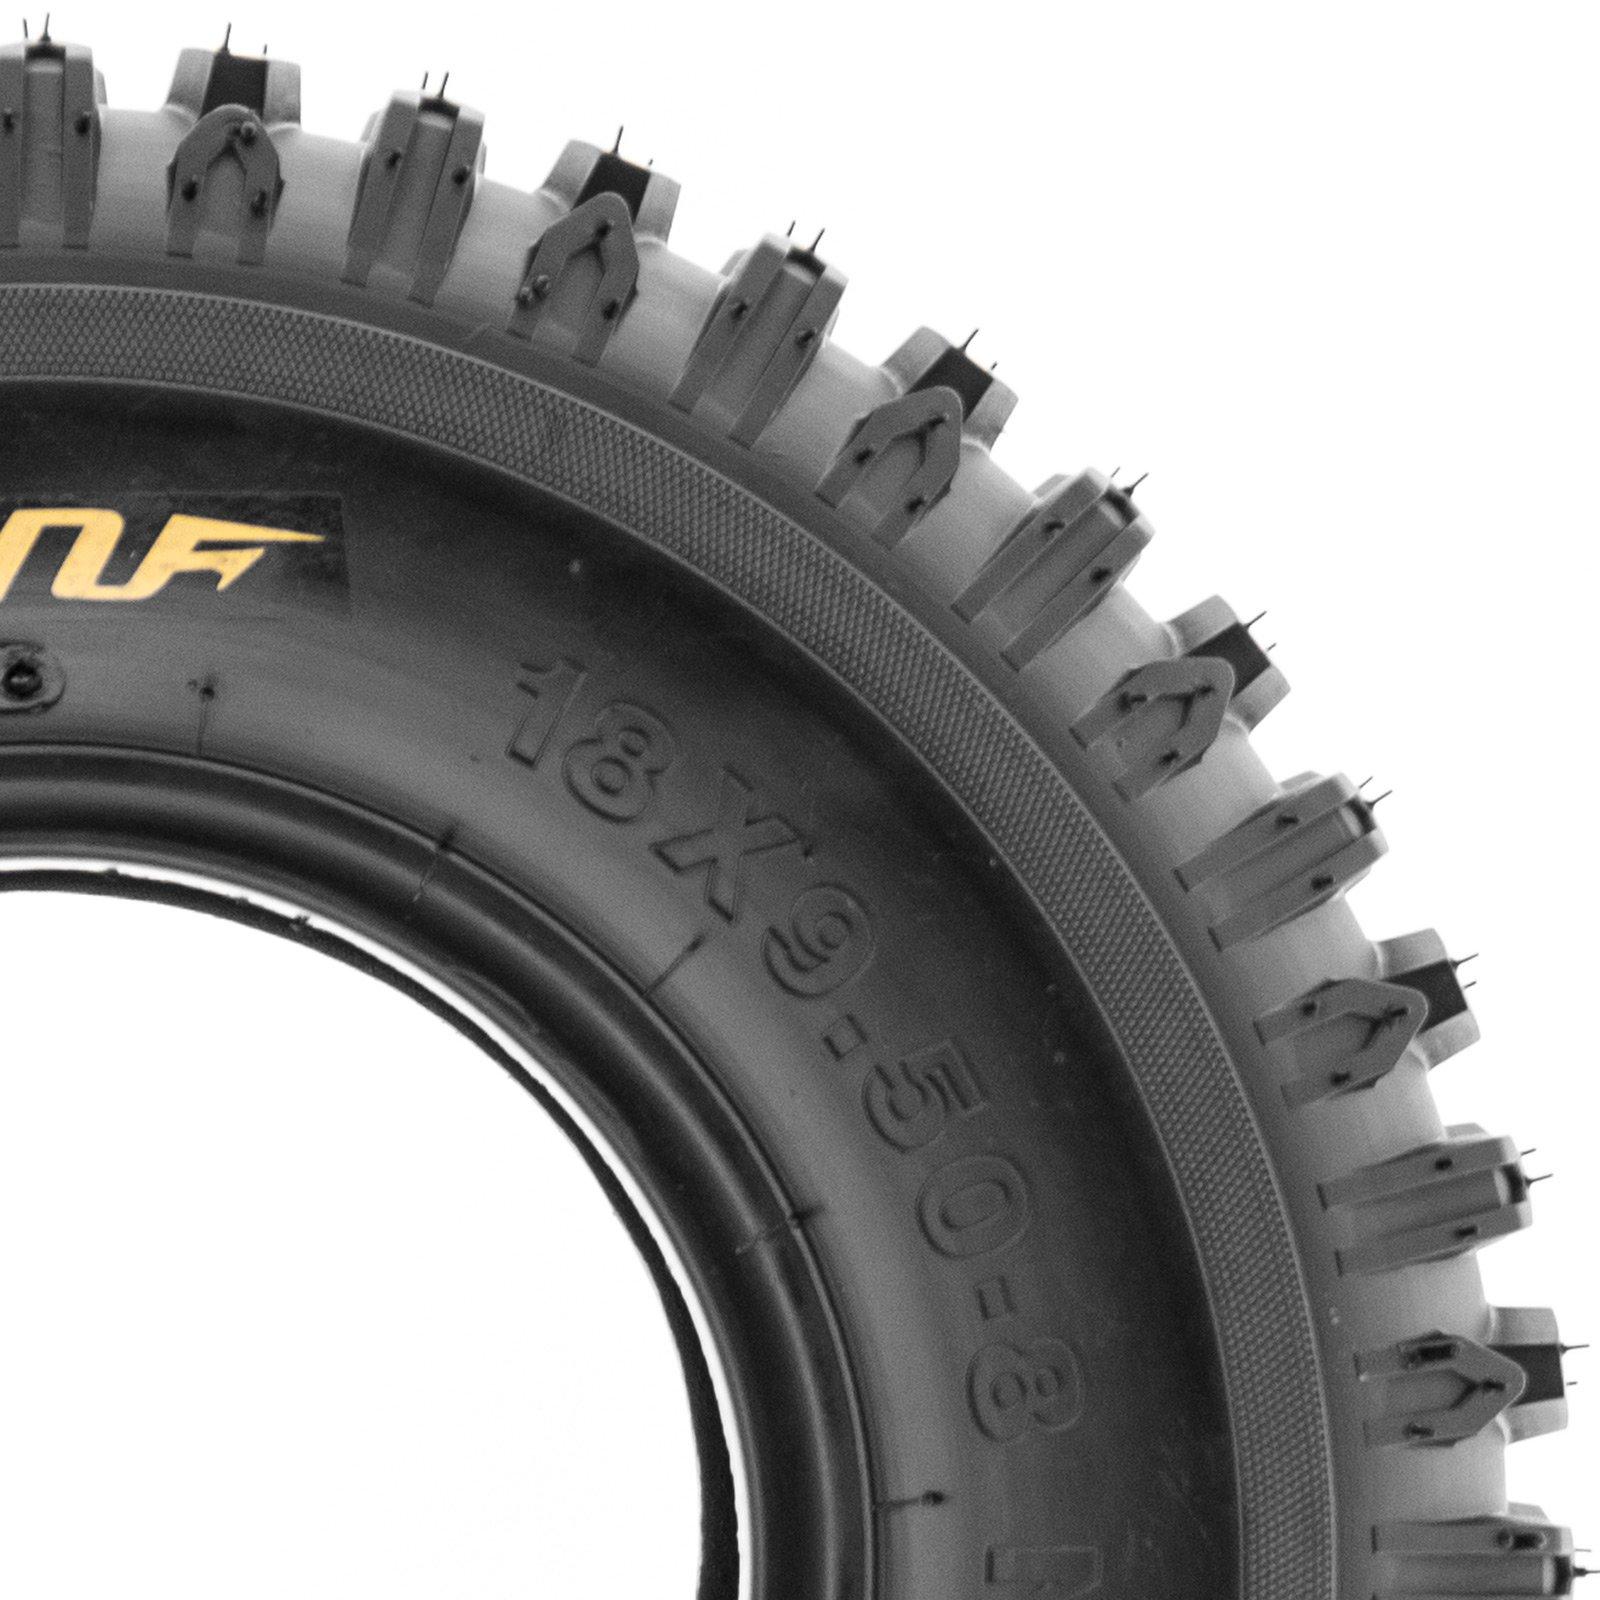 SunF Quad ATV Sport Tires 16x8-7 16x8x7 4 PR A012 (Full set of 4) by SunF (Image #10)